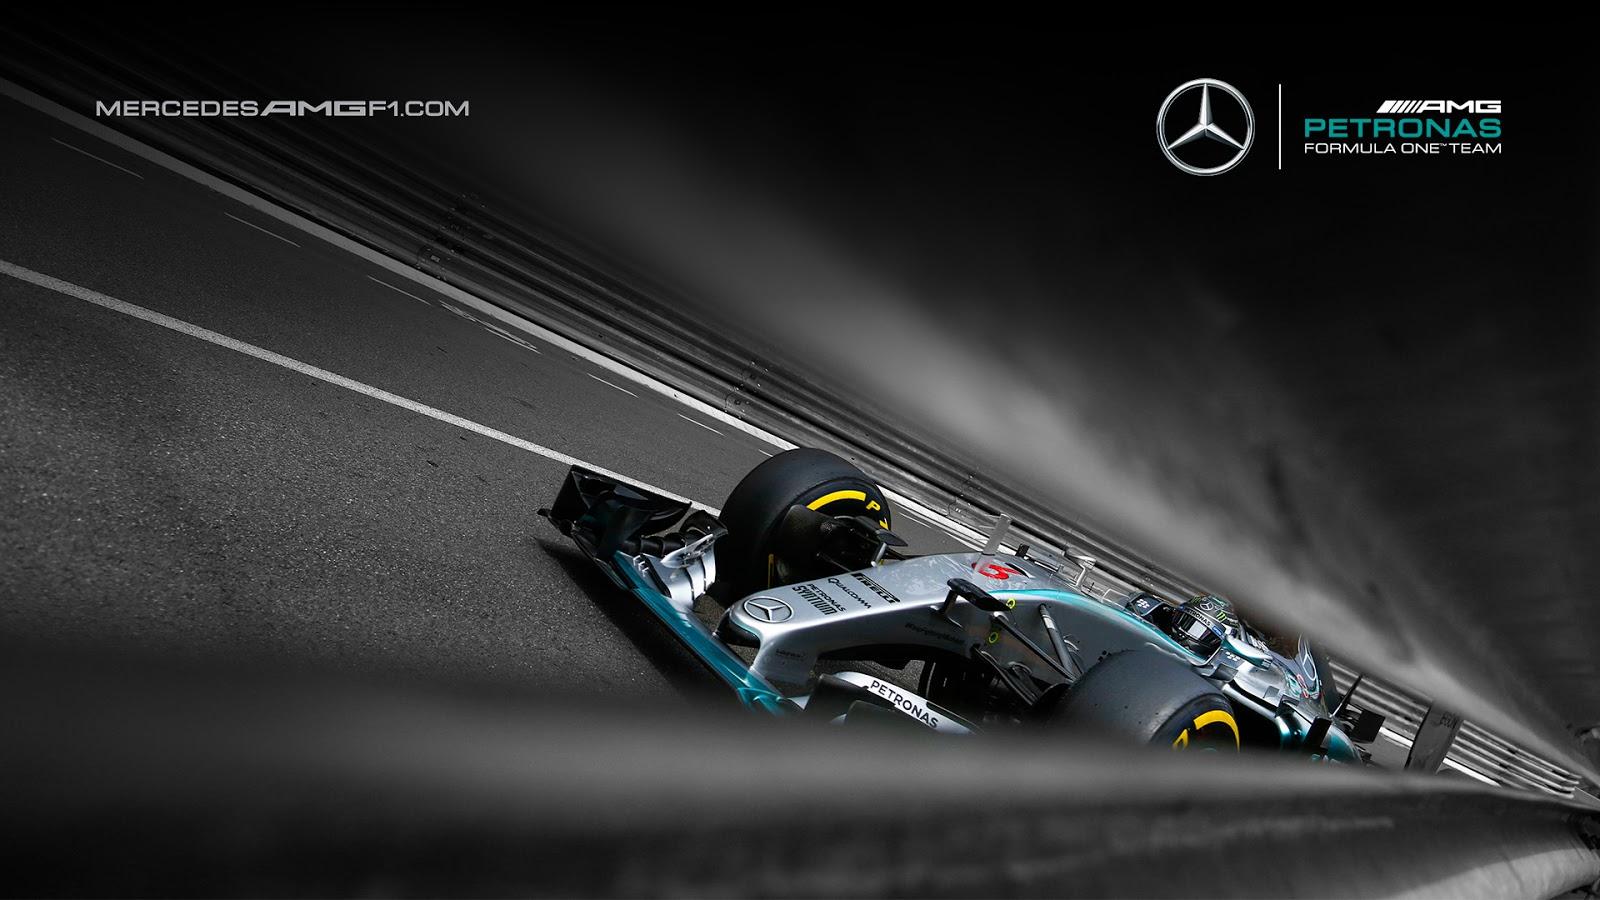 Ferrari Full Hd Wallpaper Mercedes Amg Petronas W06 2015 F1 Wallpaper Kfzoom